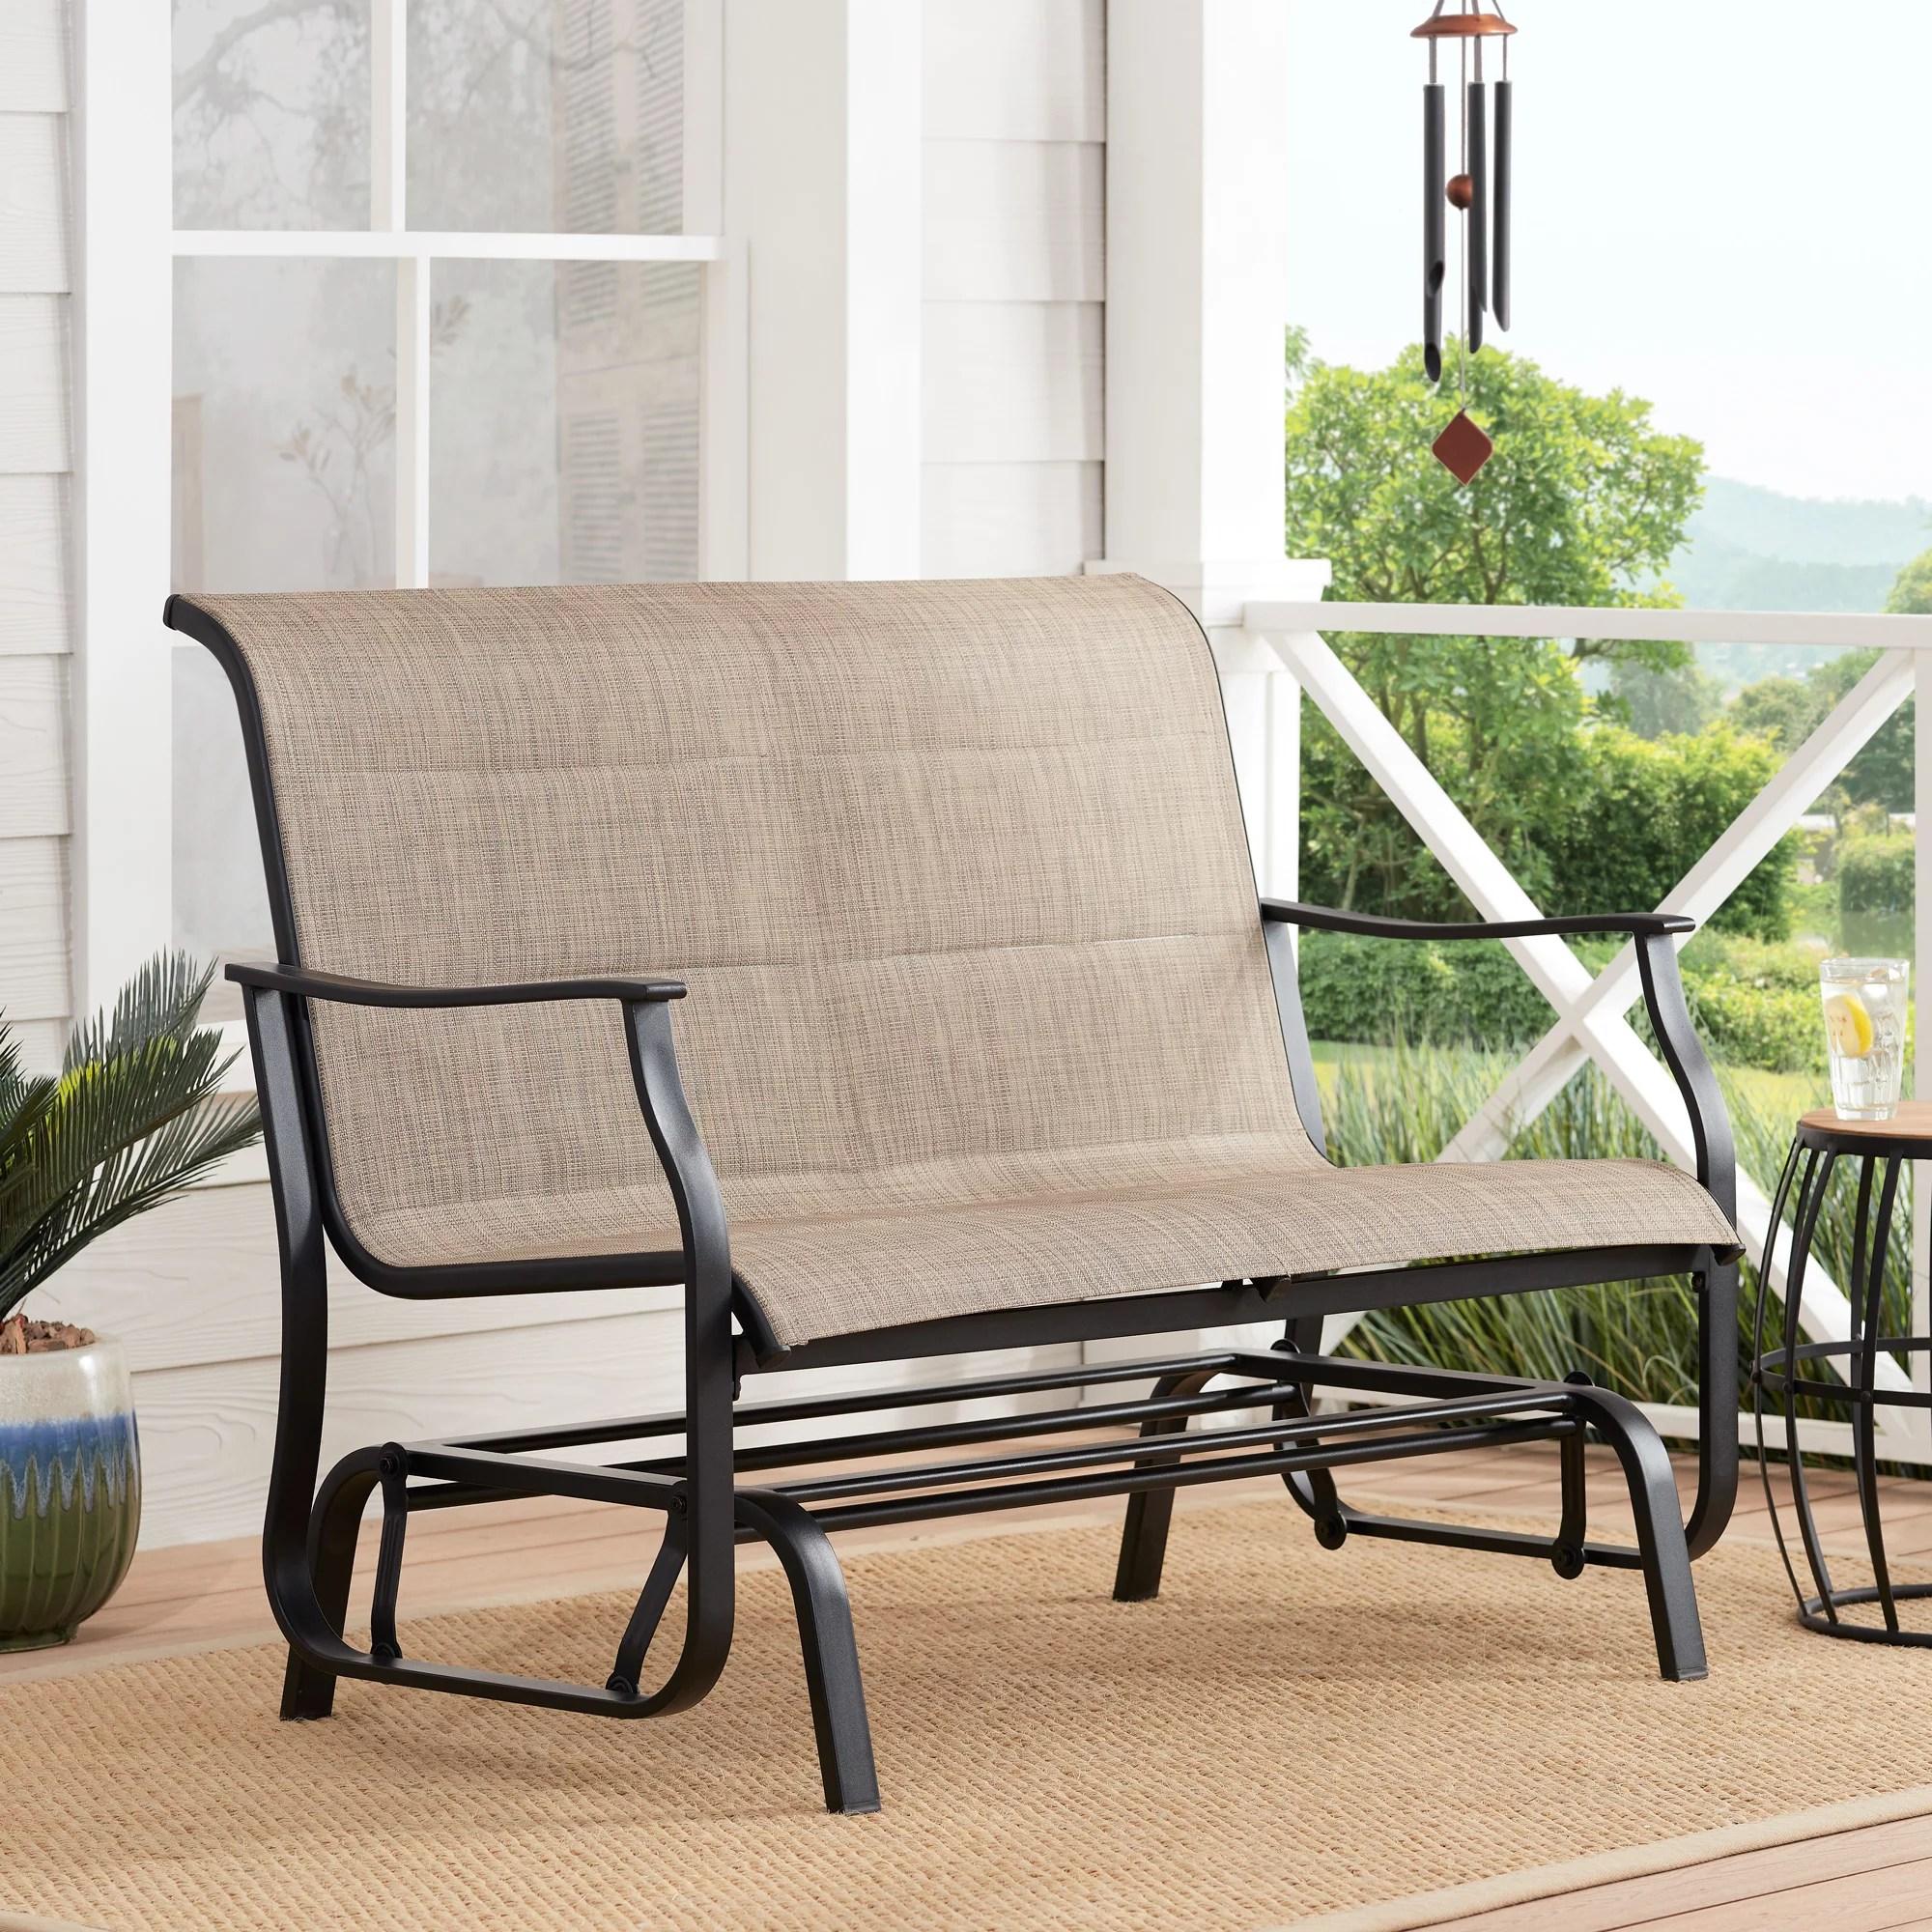 mainstays highland knolls outdoor patio glider bench